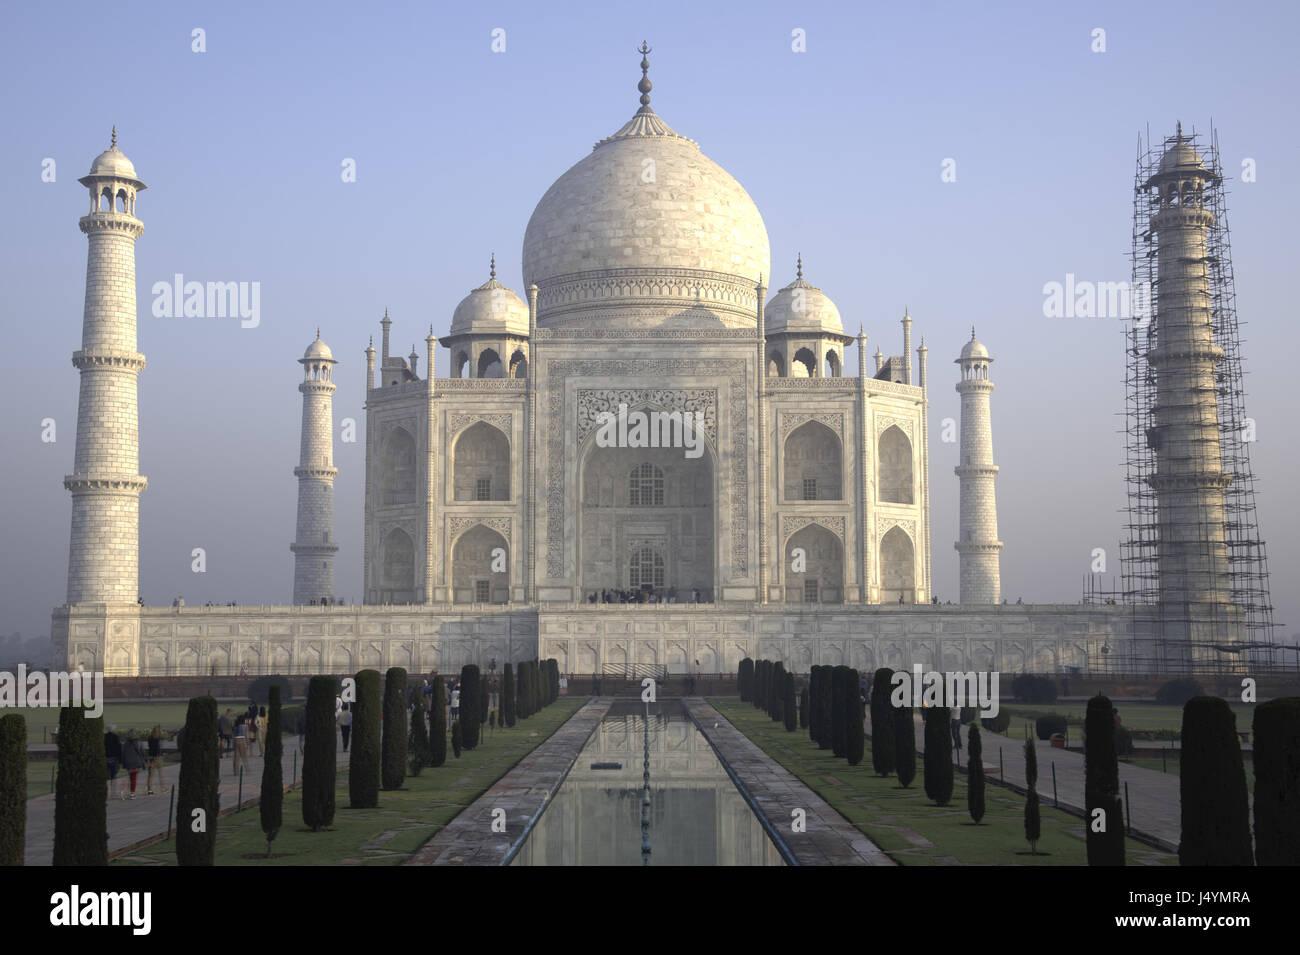 Blick auf das Taj Mahal im Bau, Agra, Indien Stockbild